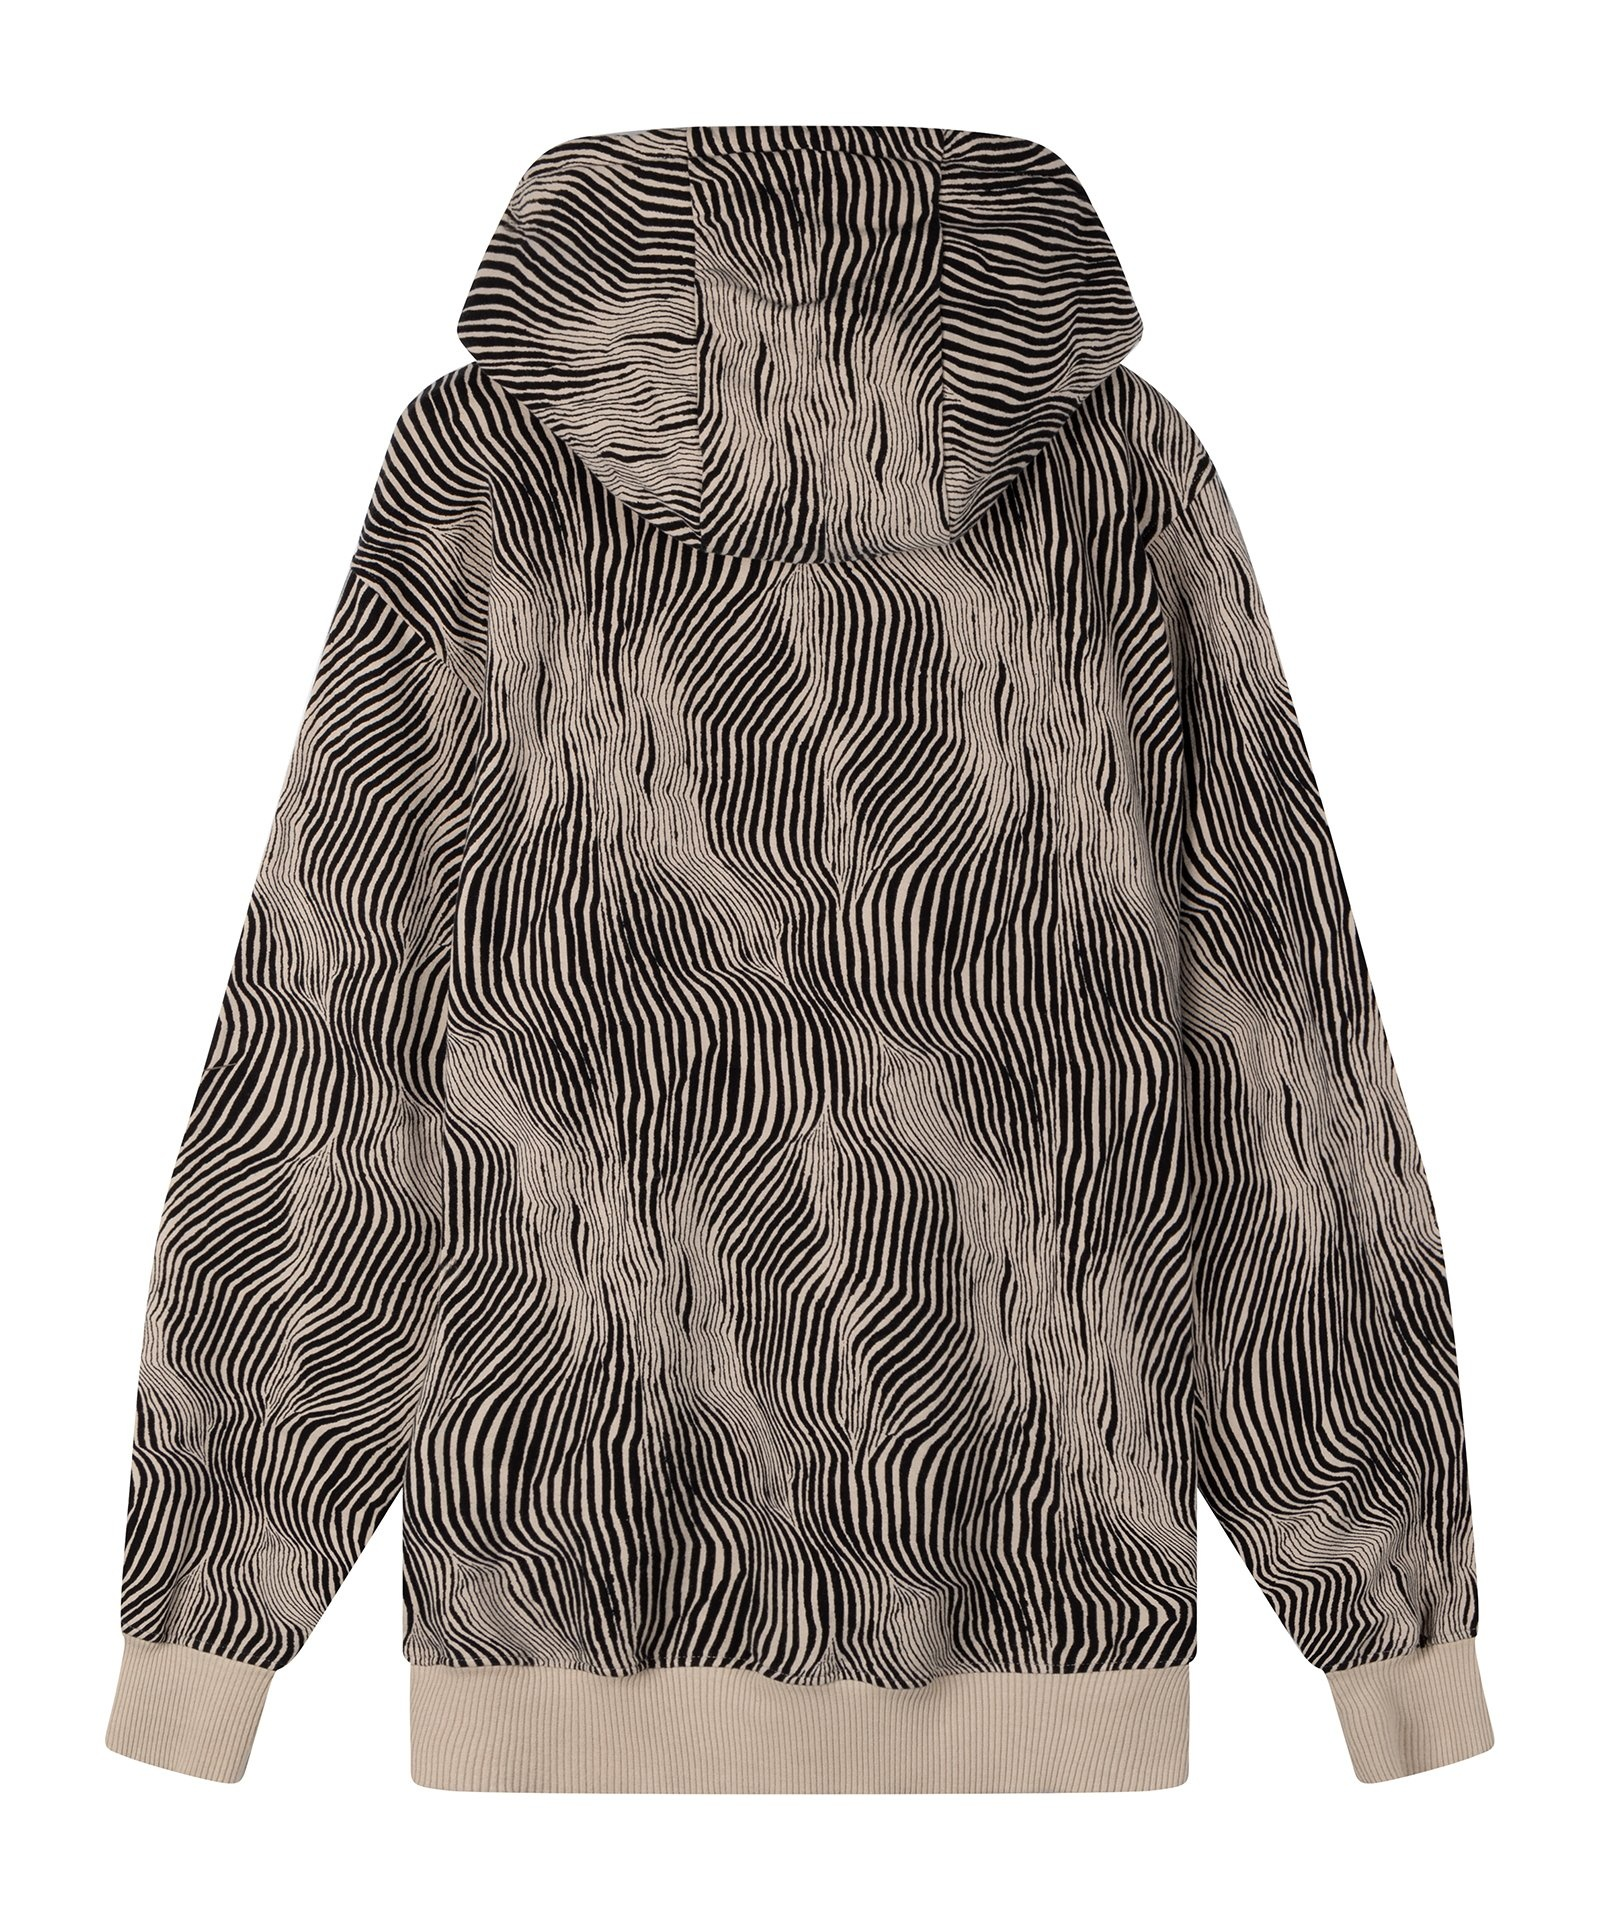 Trui hoodie zebra safari-4